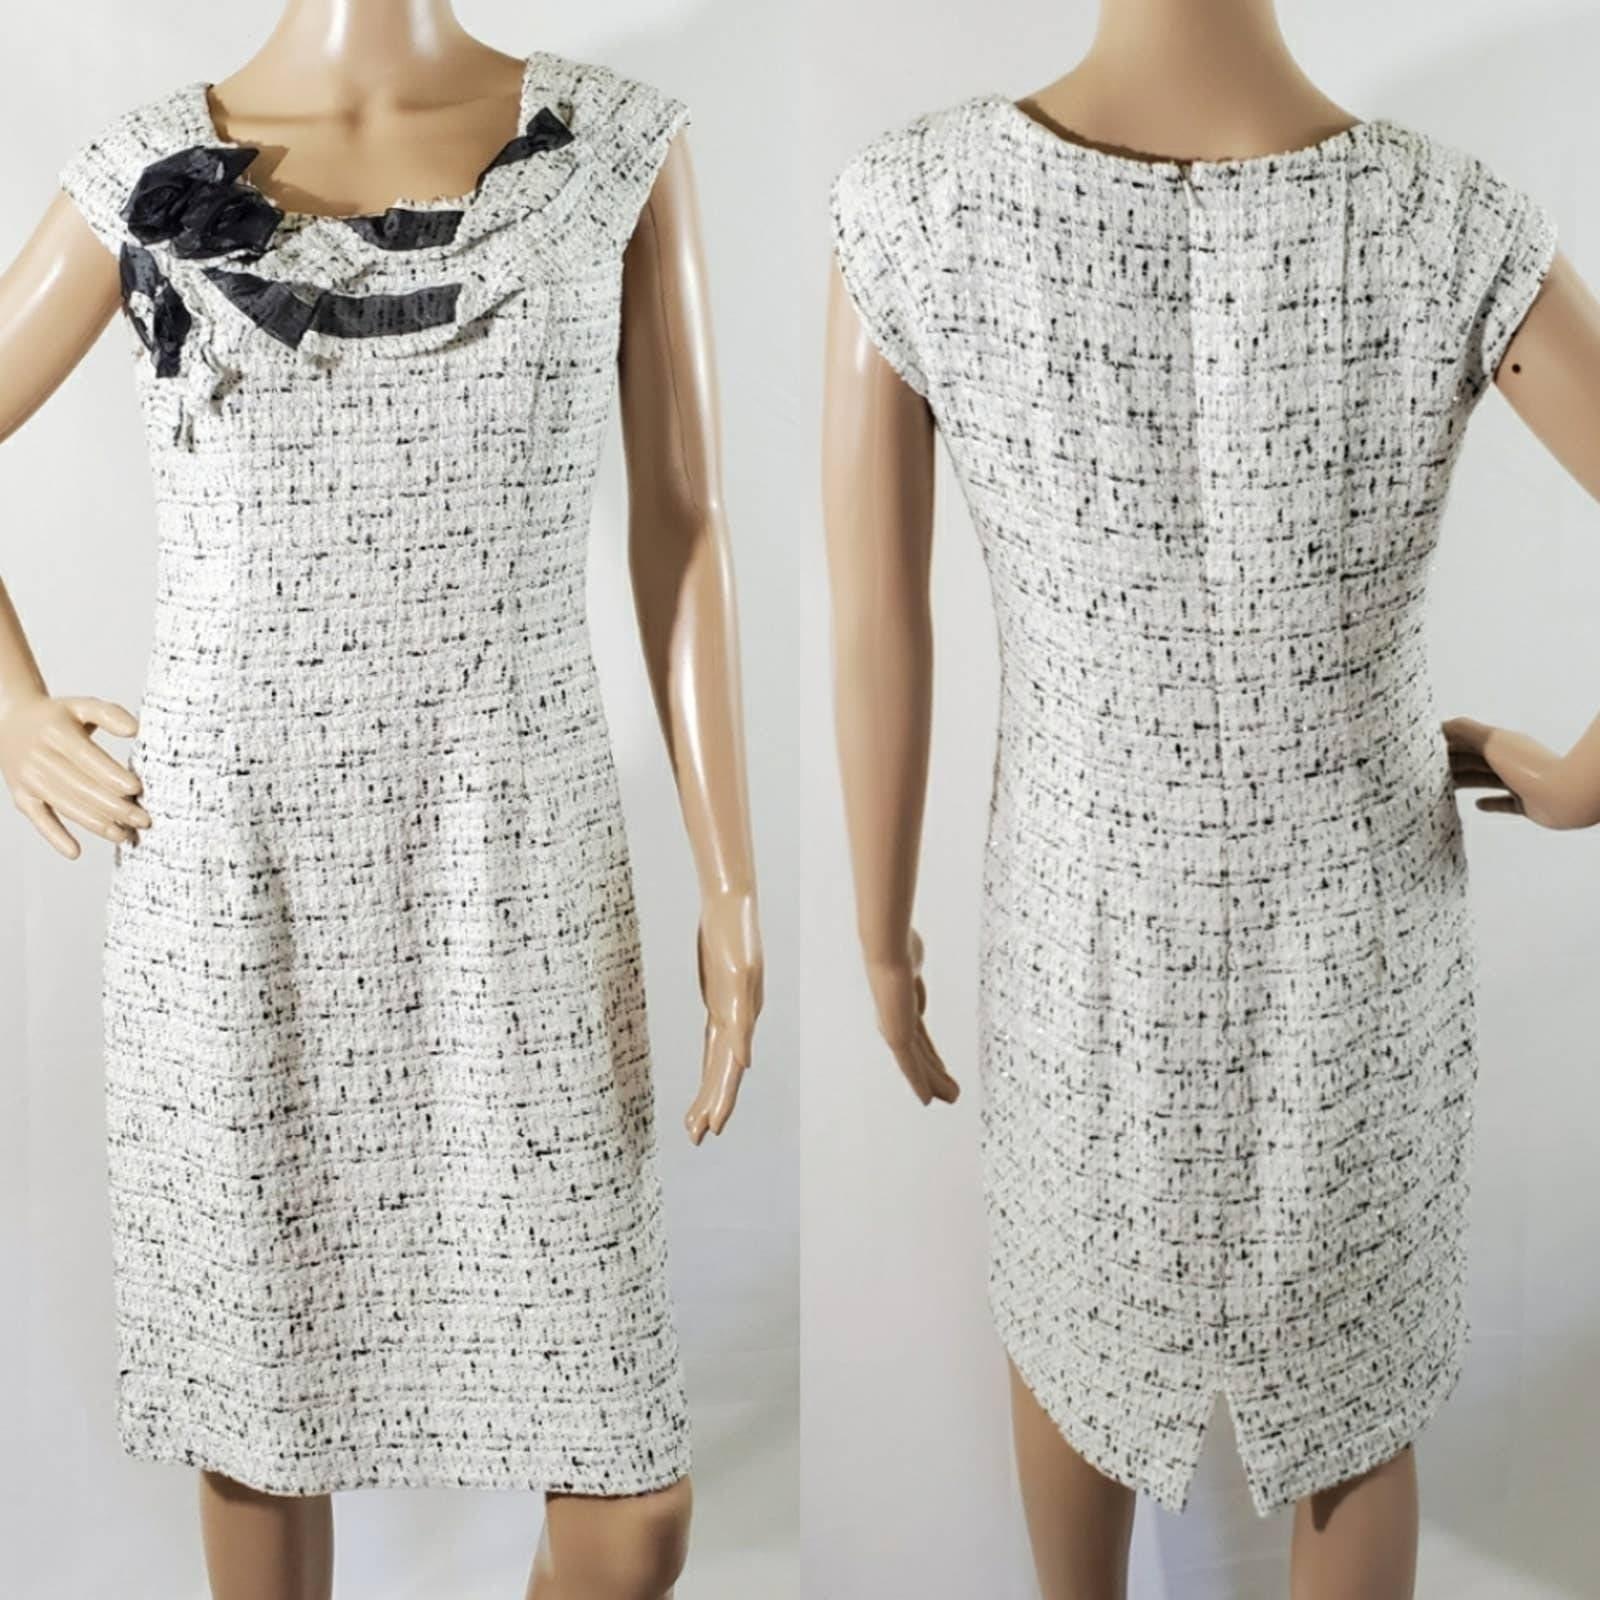 KAY UNGER NY White Tweed Midi Dress Sz 6